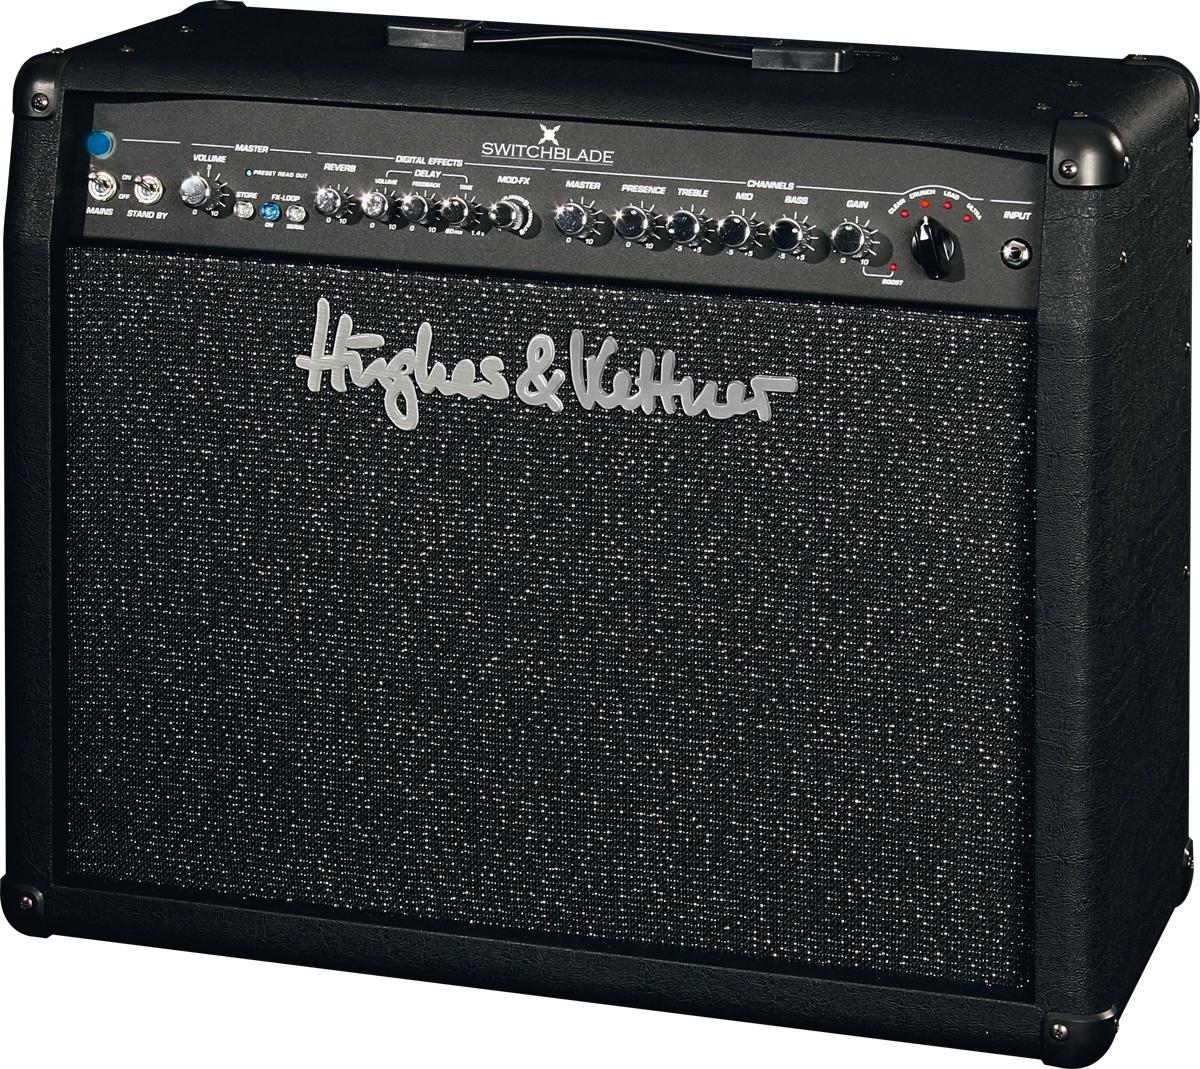 Hughes & Kettner Switchblade 50 Tsc Combo